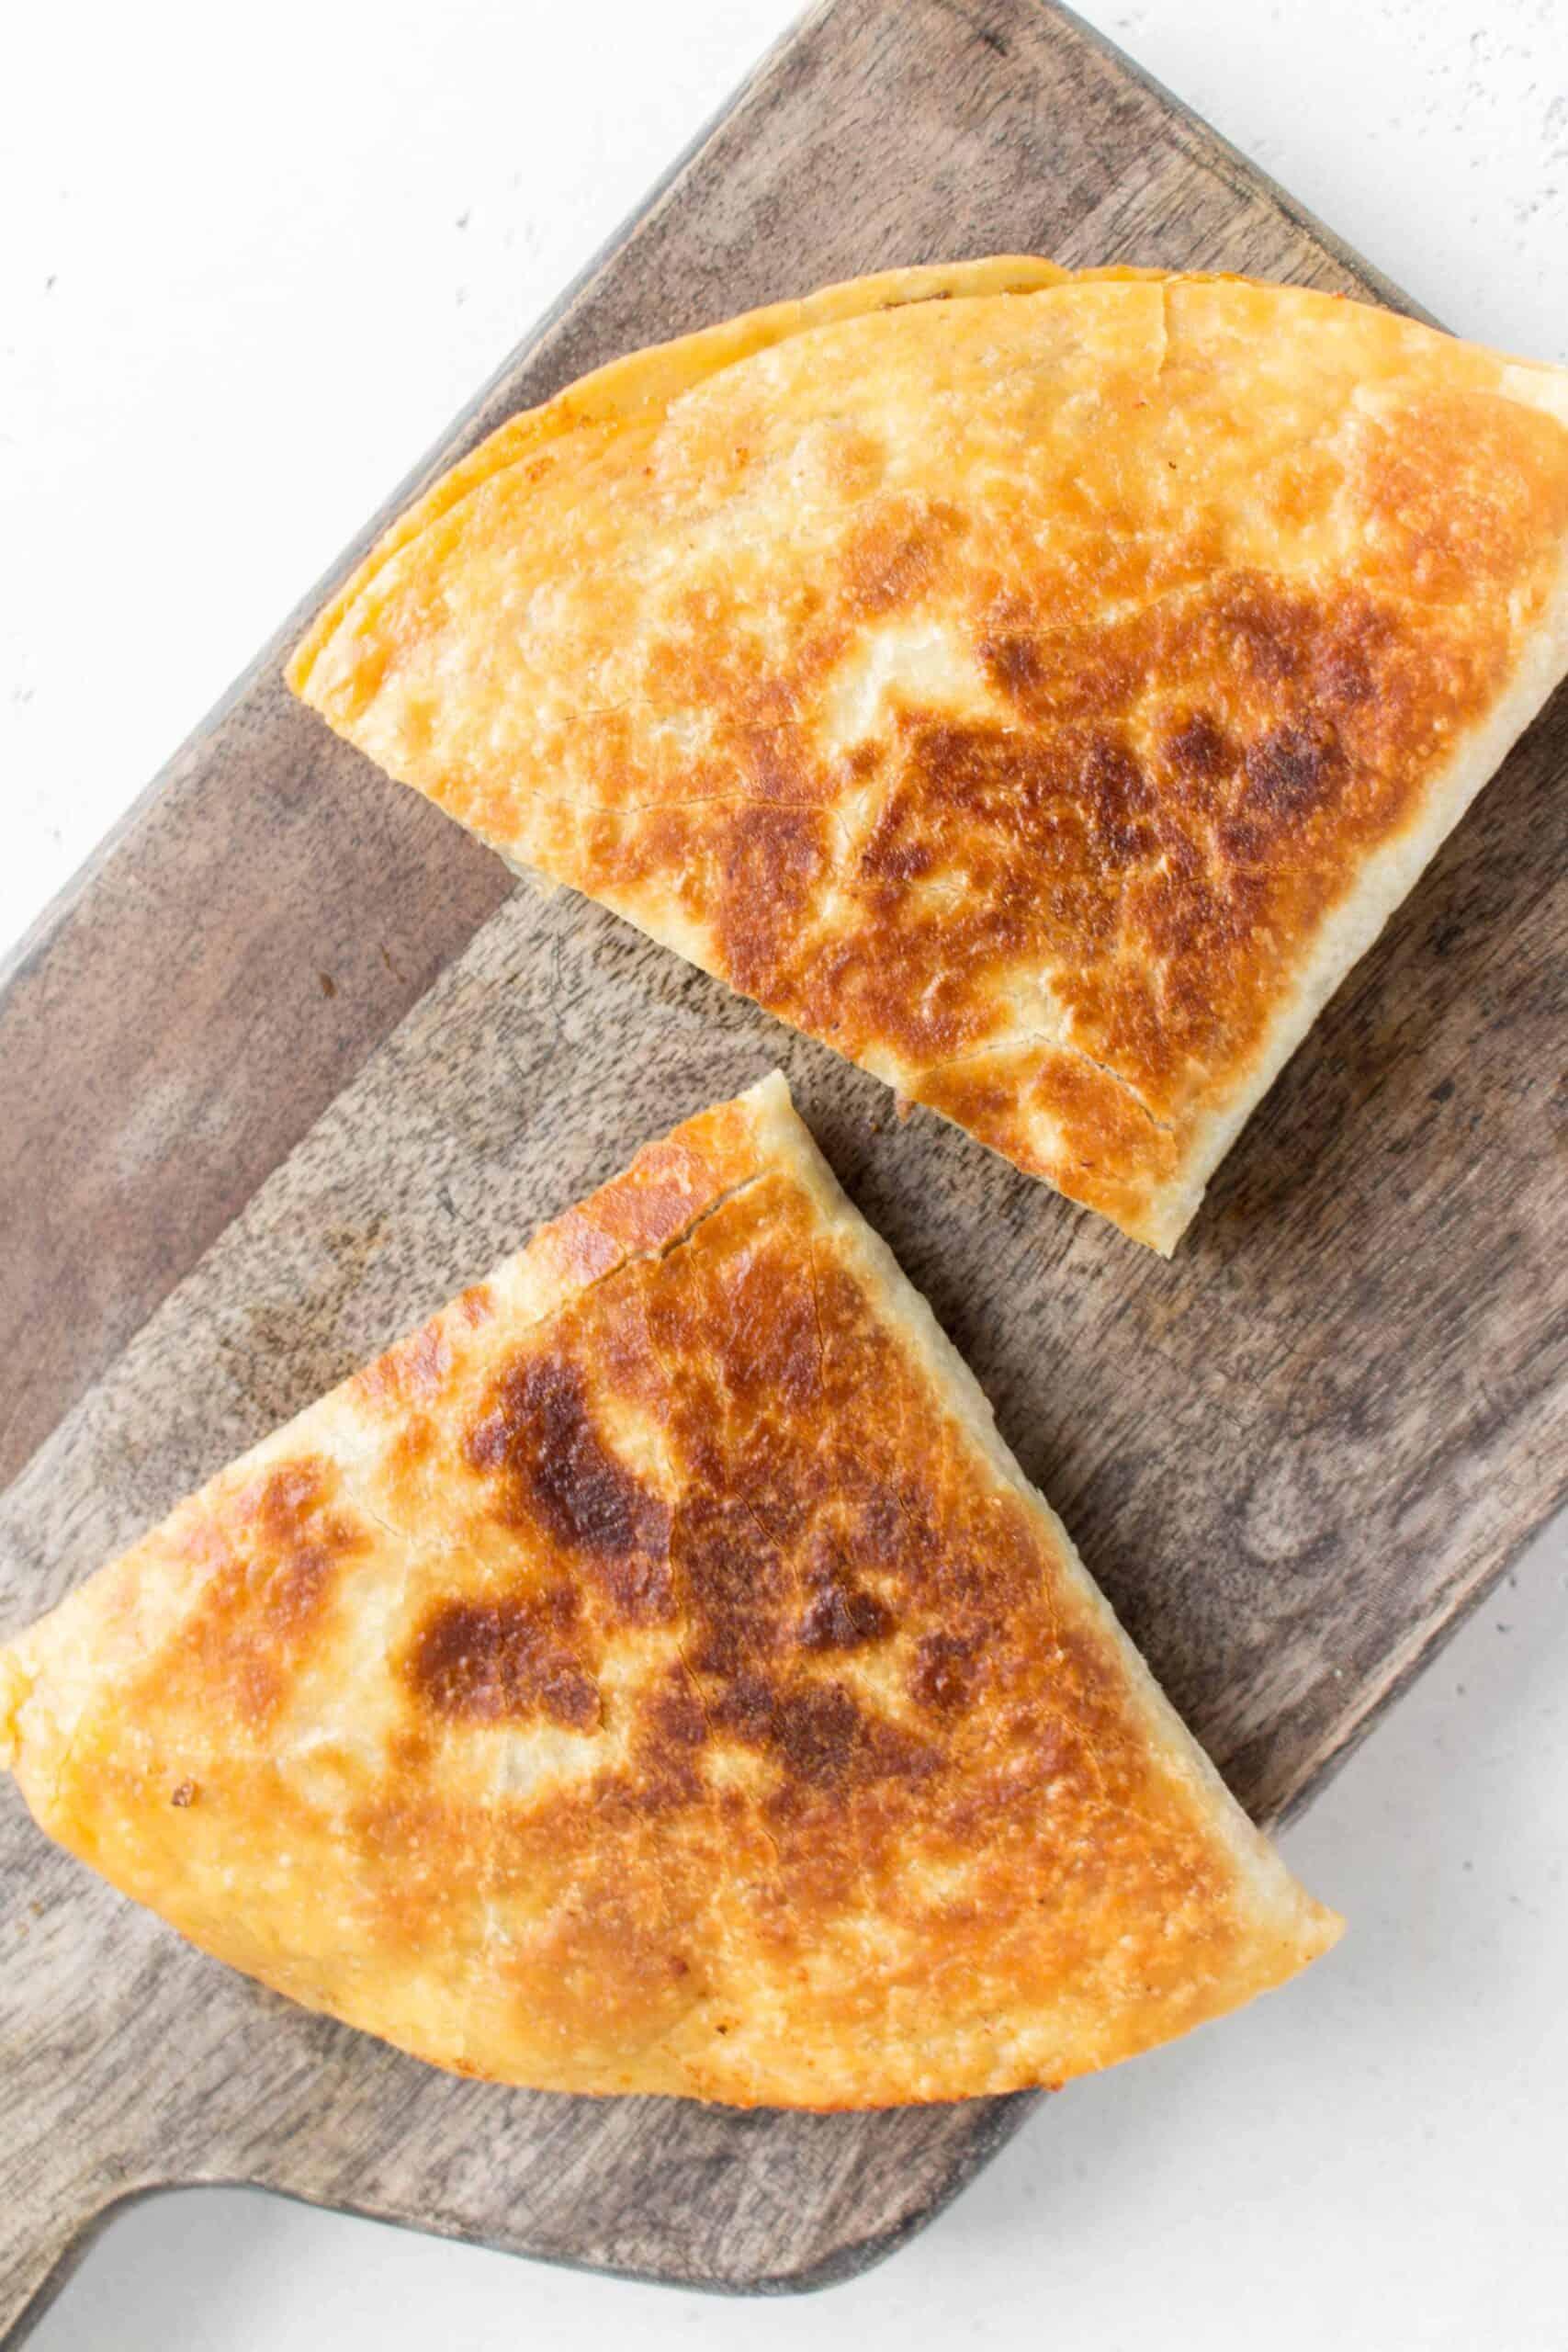 quesadilla cut in half